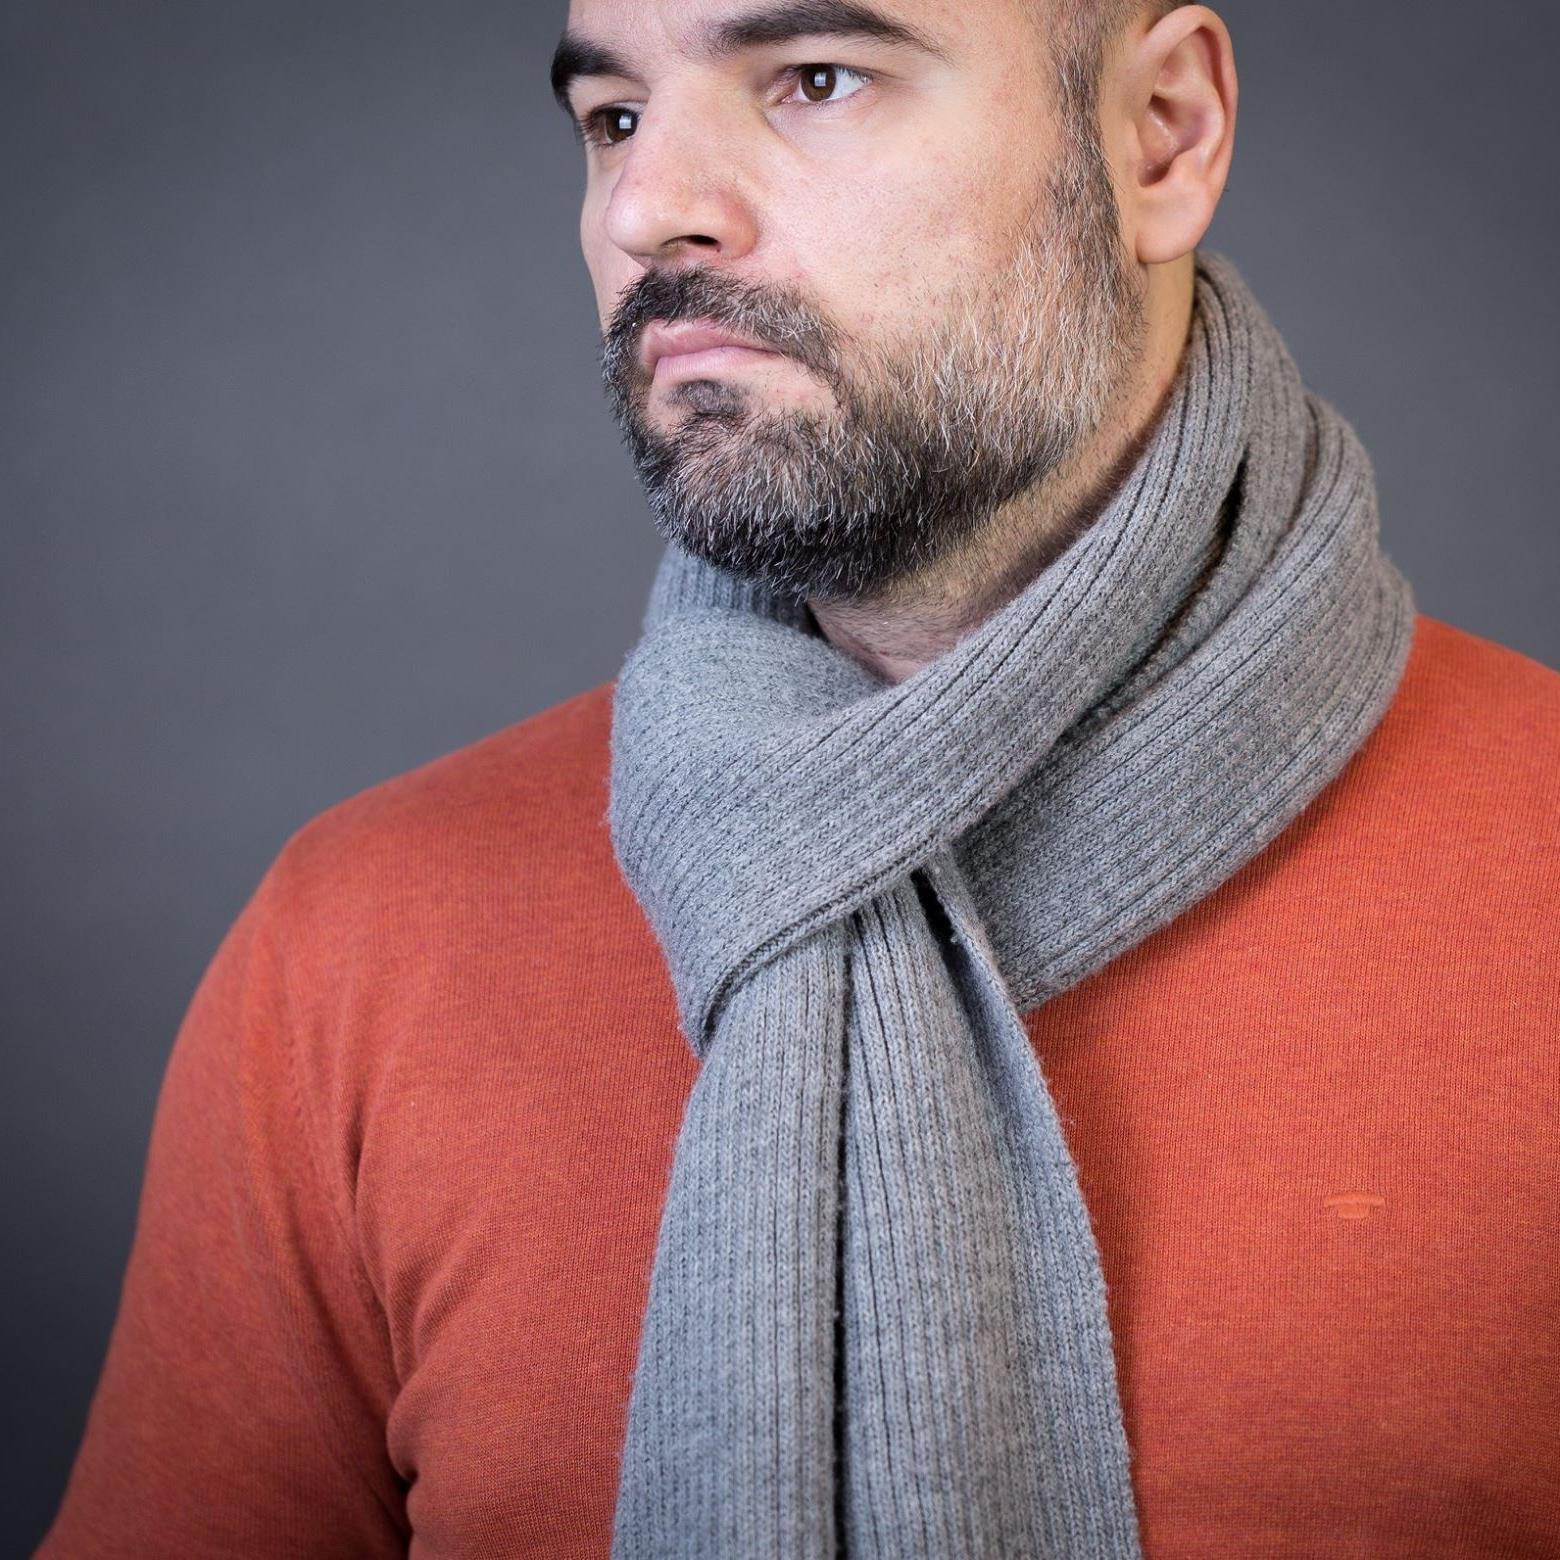 Avatar of user Nikola Knezevic